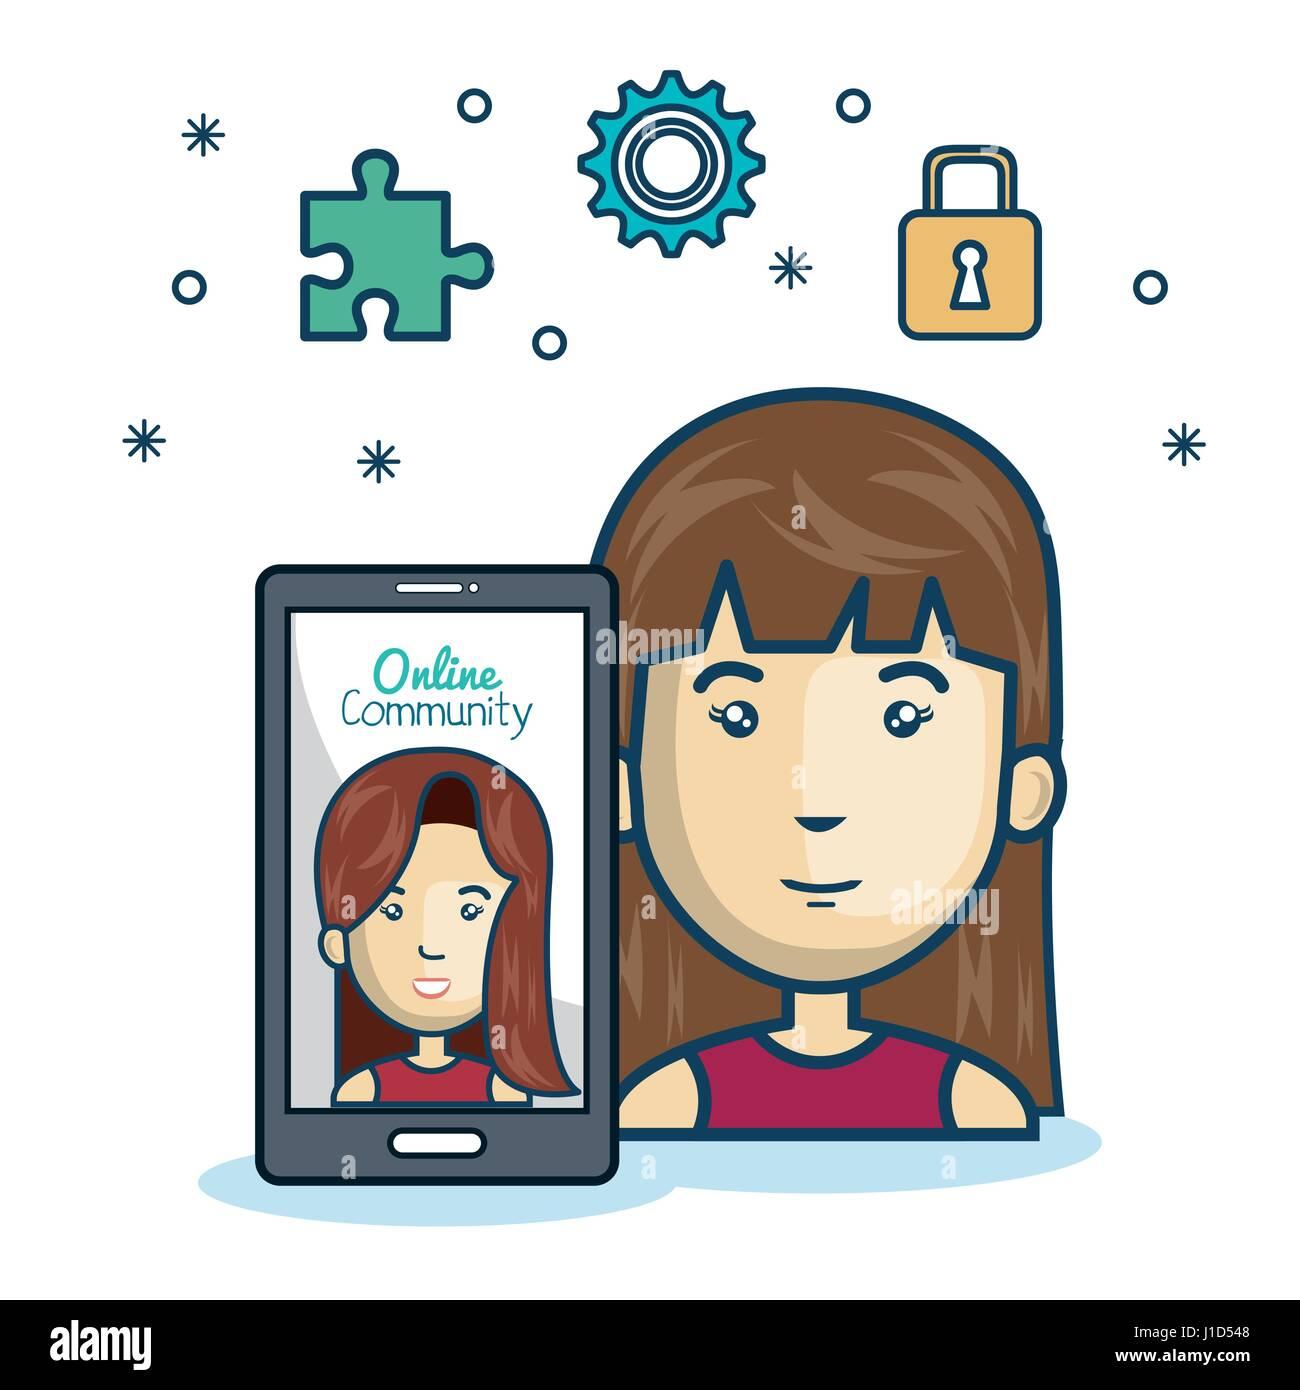 woman community online smartphone with app media design - Stock Image